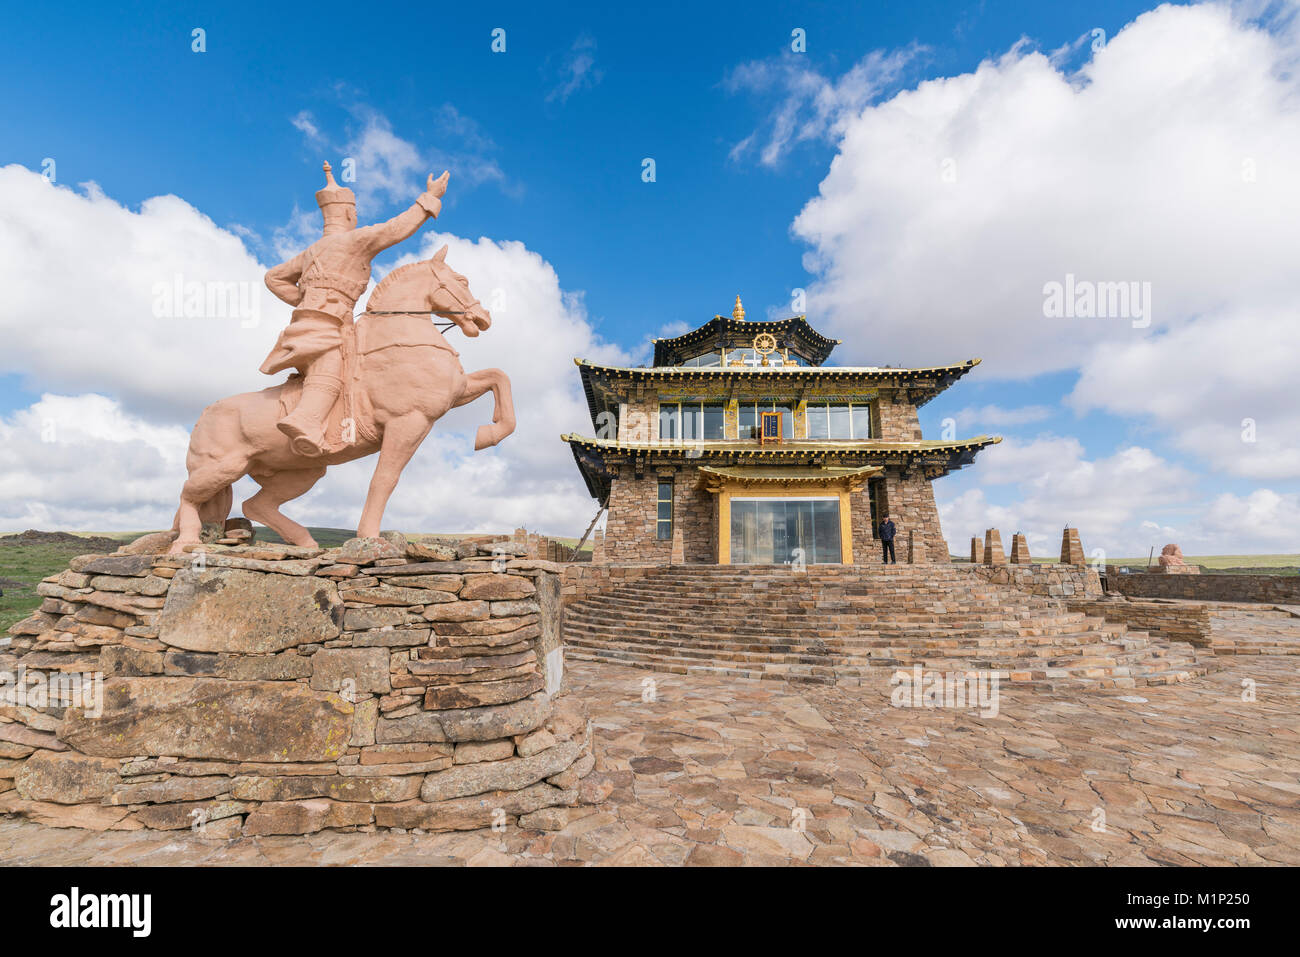 Tsorjiin Khureenii Tempel und Dschingis Khan Statue, Mitte der Provinz Gobi, Mongolei, Zentralasien, Asien Stockbild